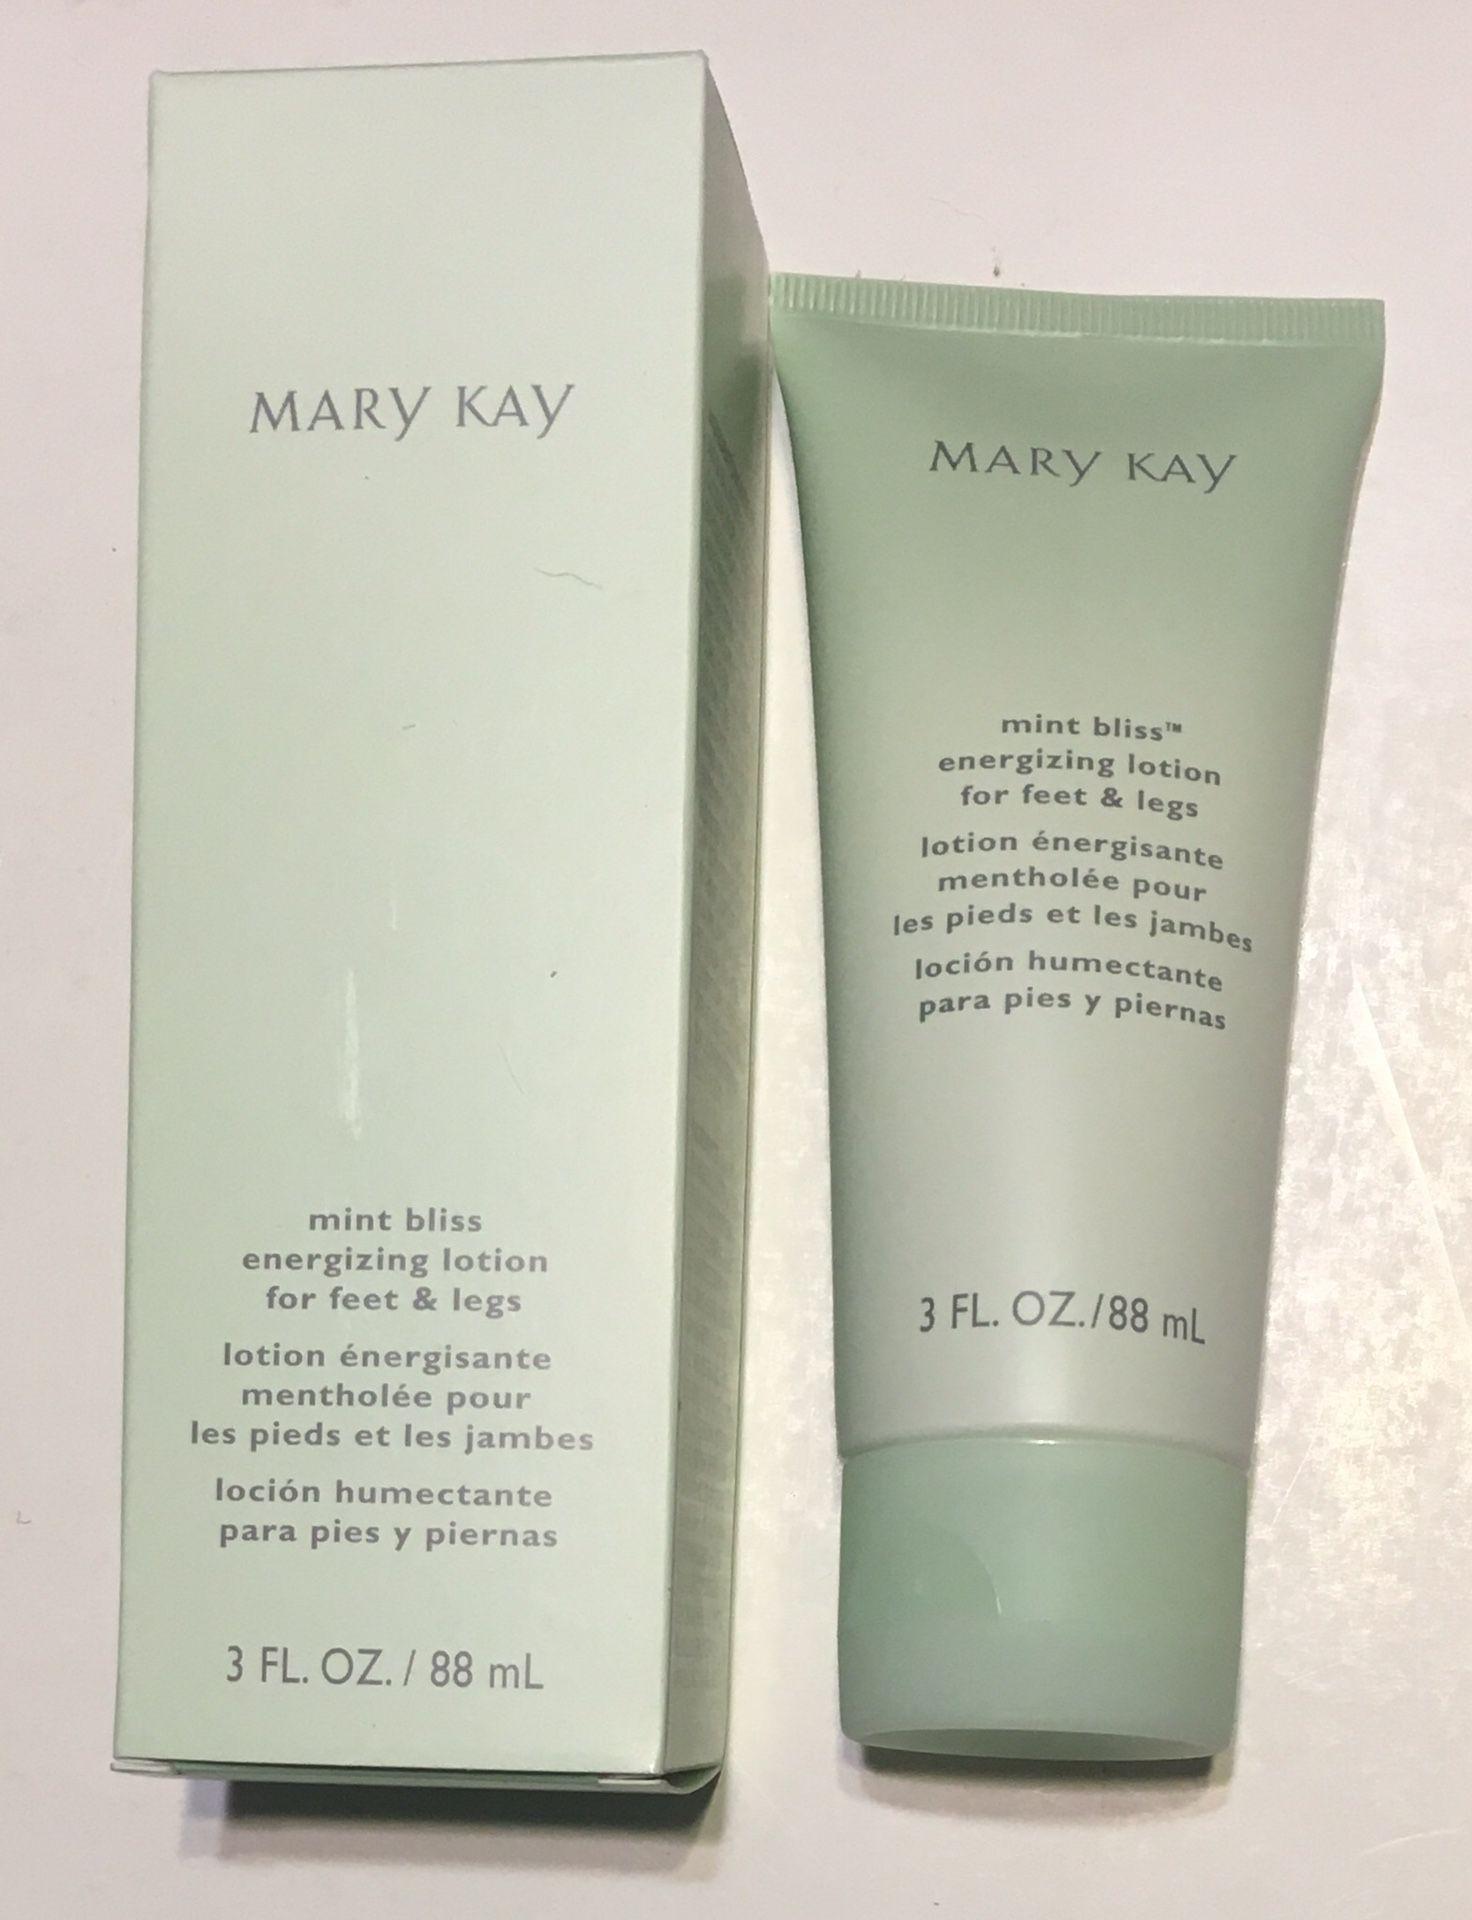 Mary Kay foot and leg lotion